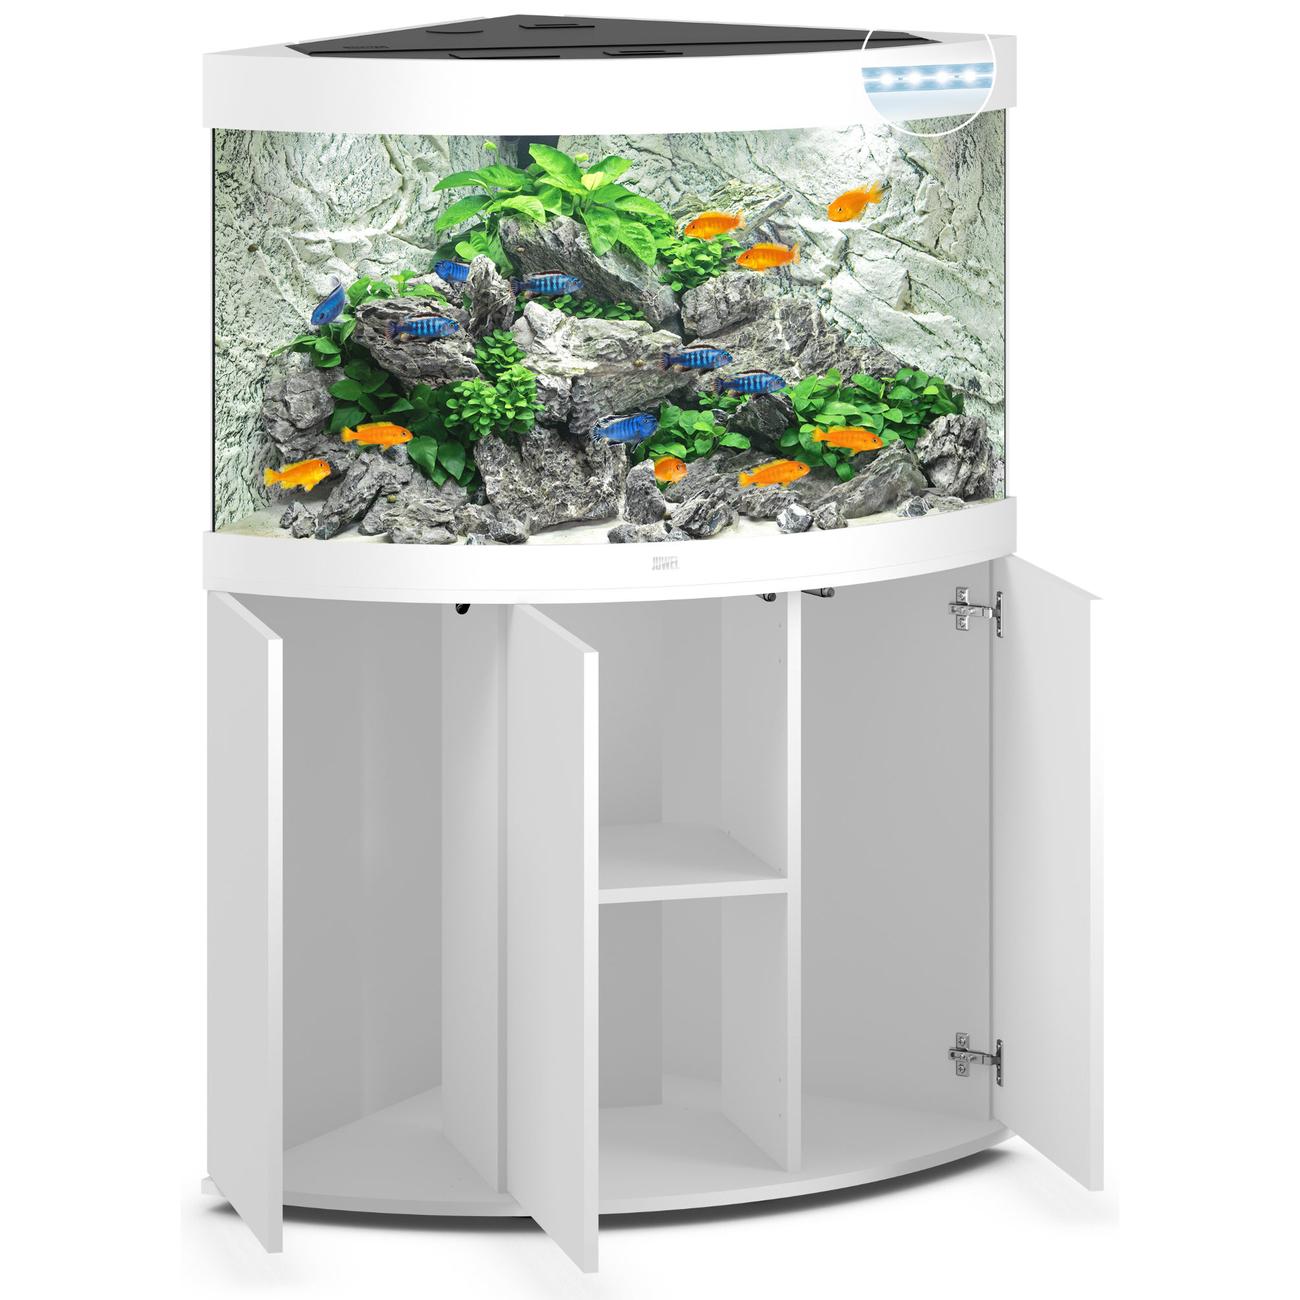 Juwel Trigon 190 LED Eck-Aquarium mit Unterschrank Bild 9